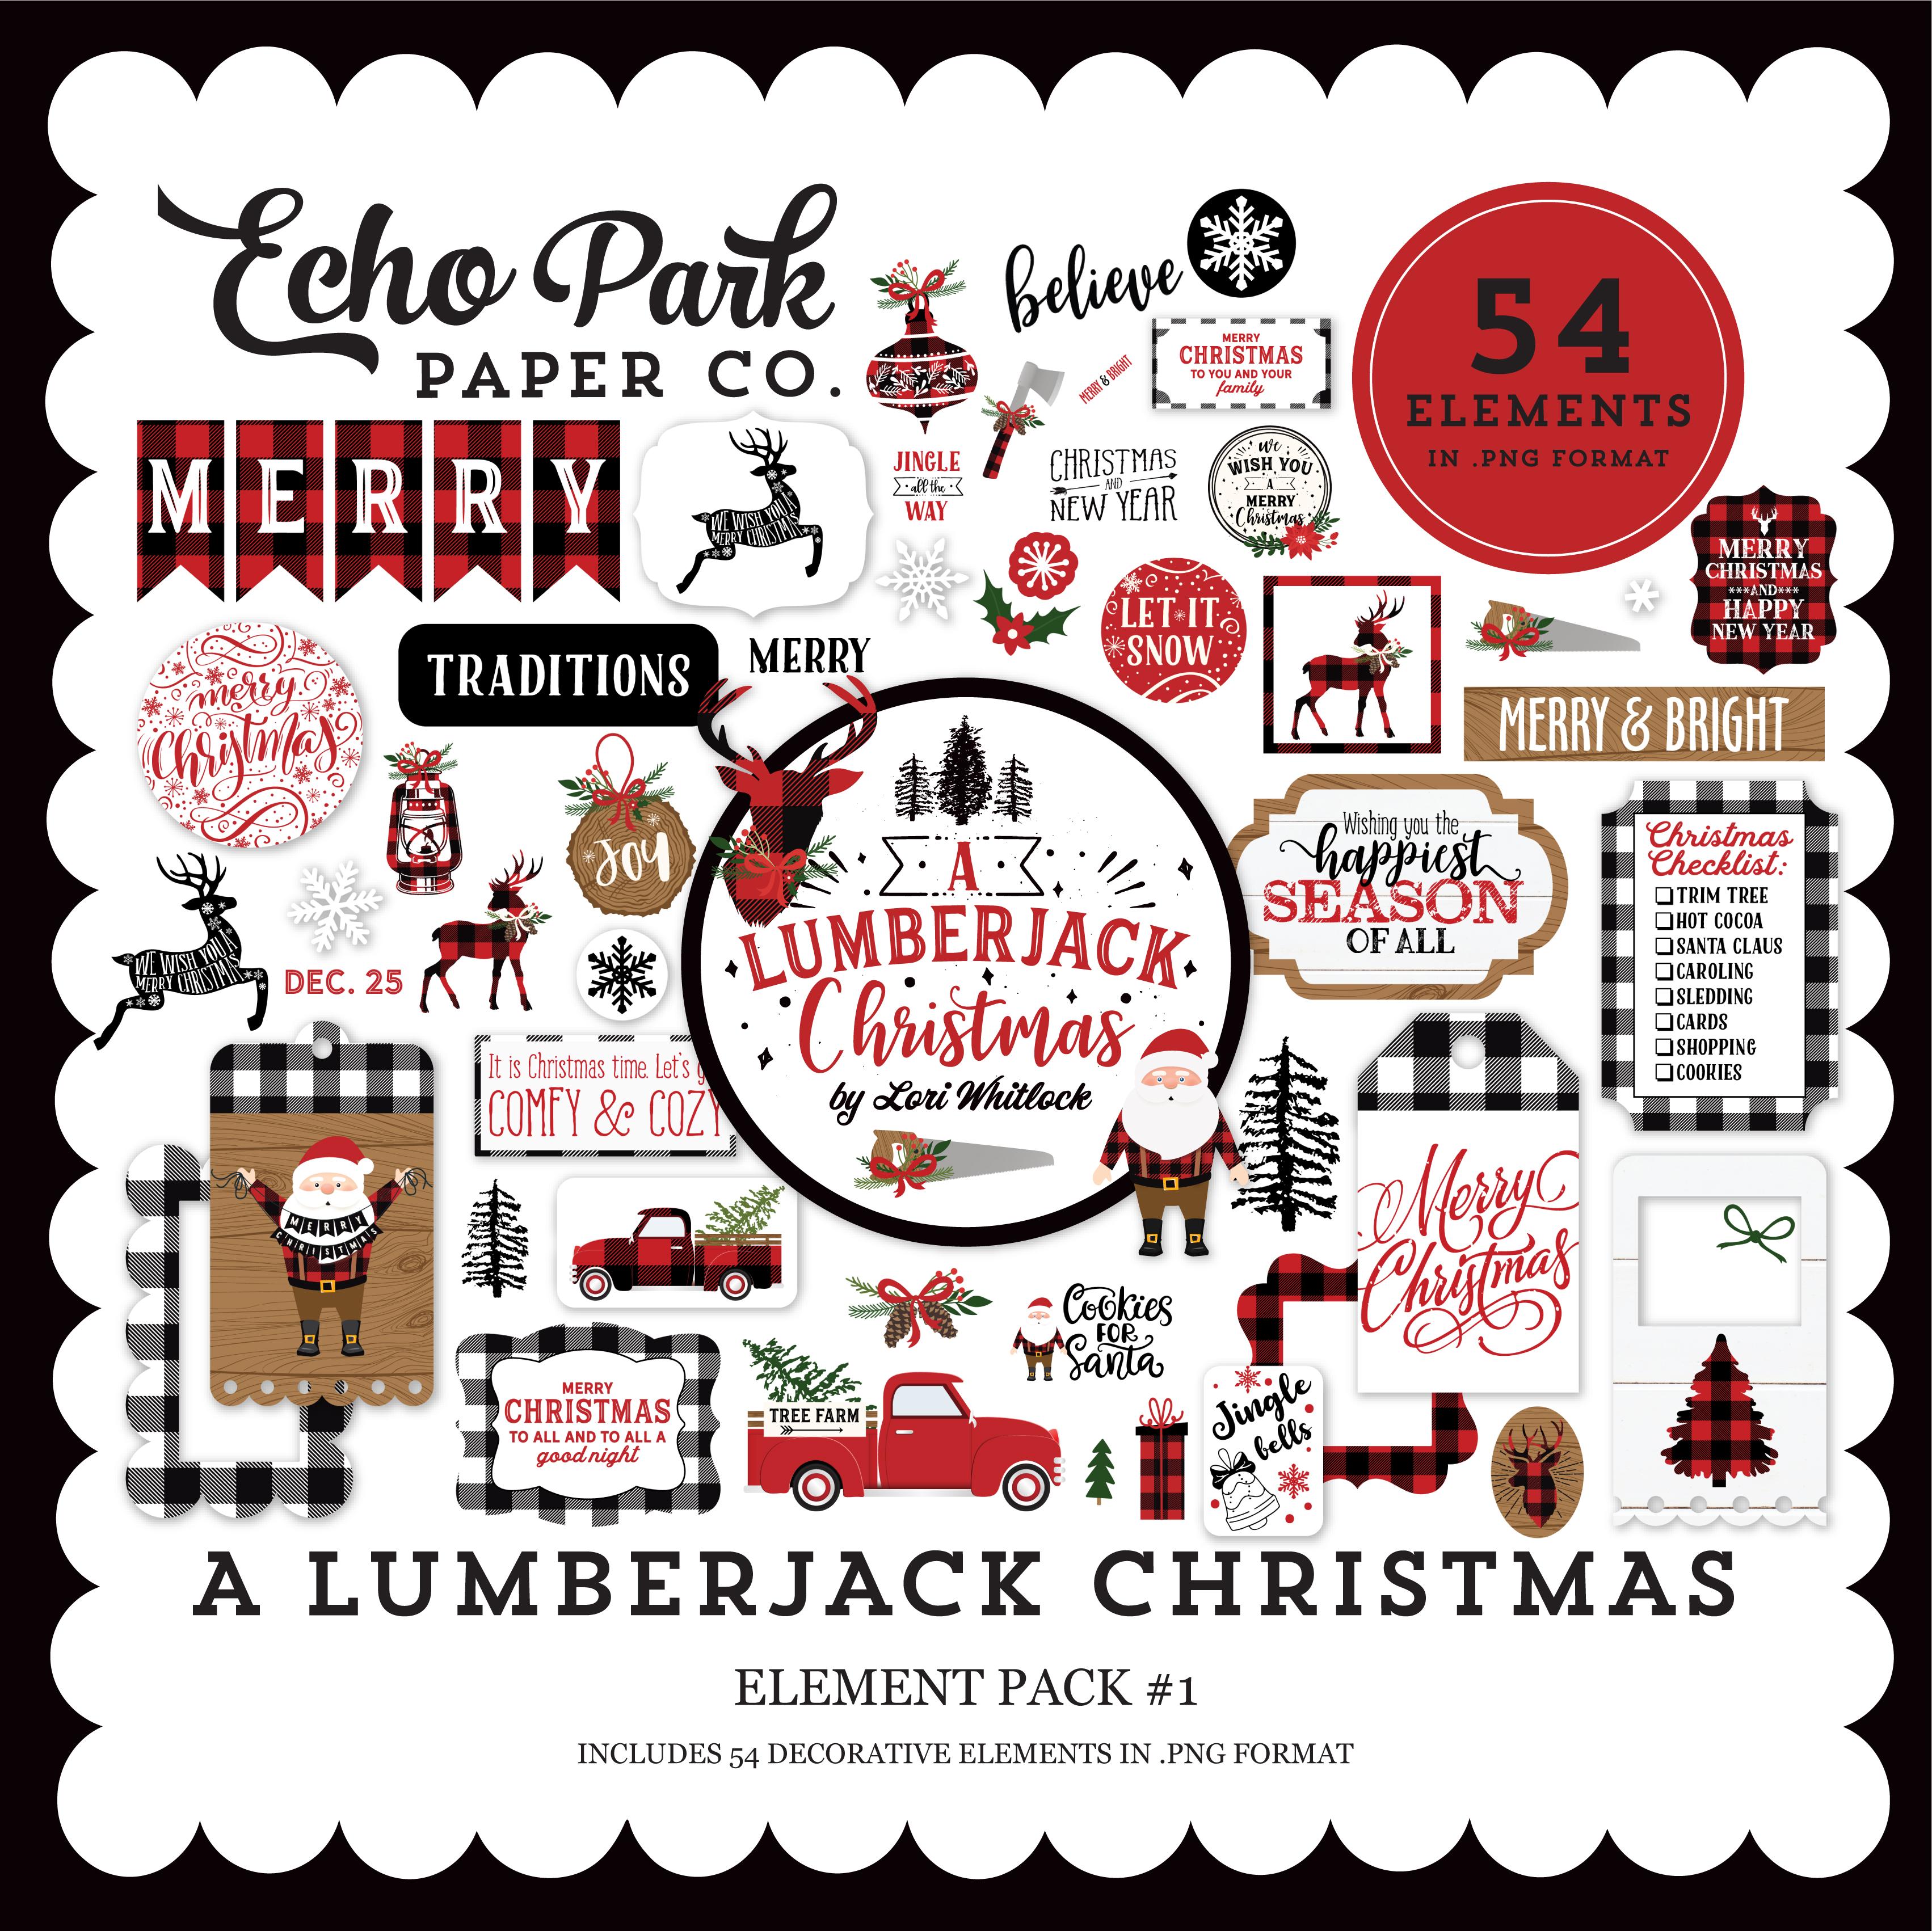 A Lumberjack Christmas Element Pack #1